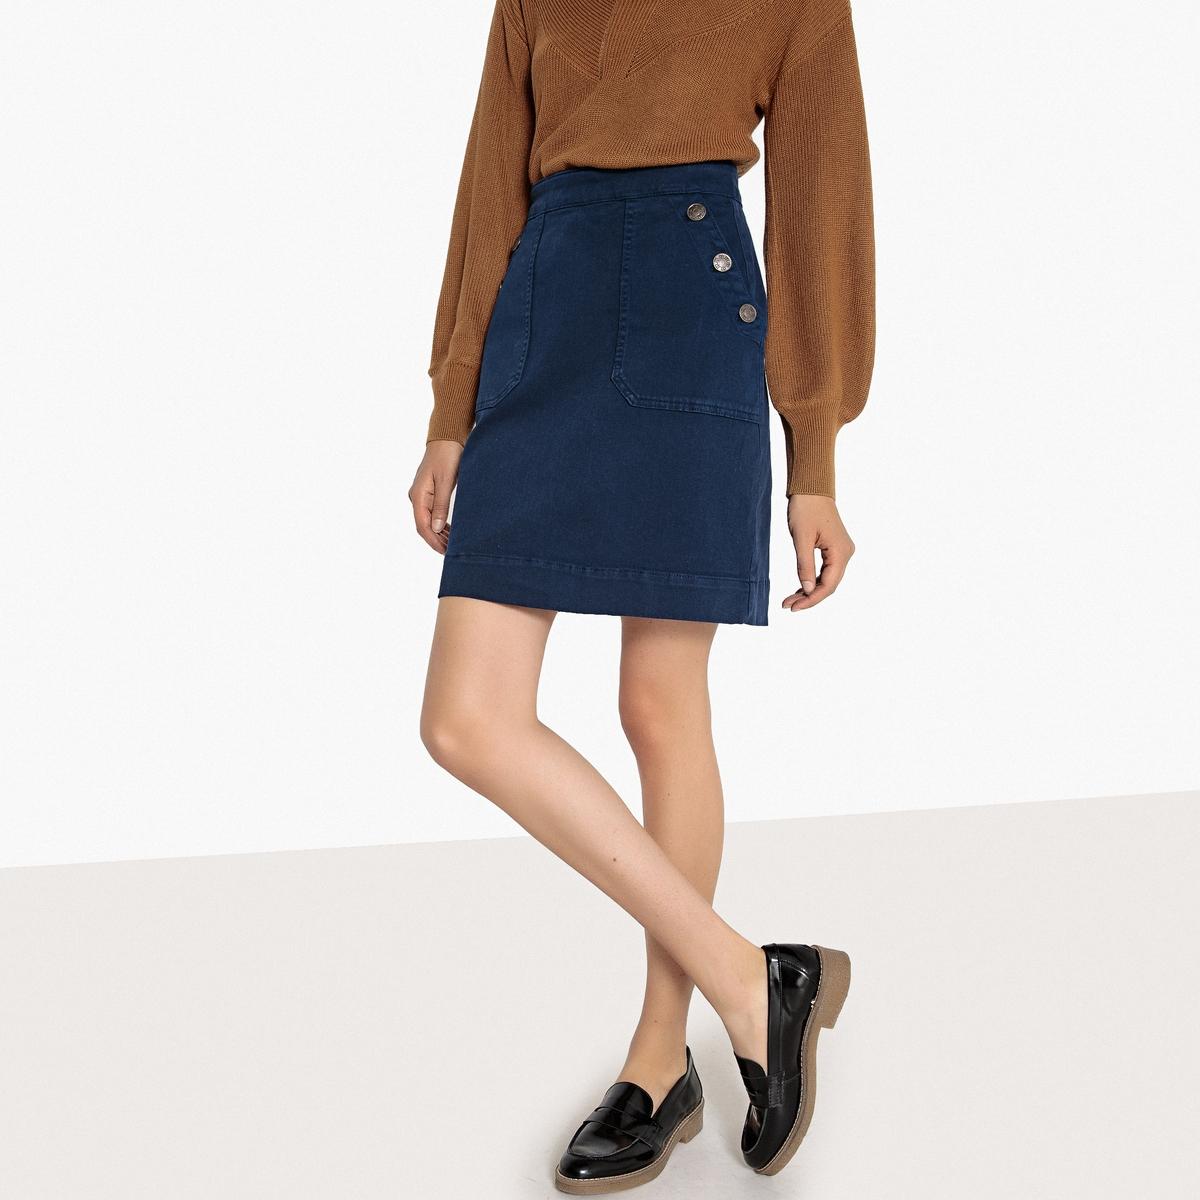 Falda de denim 2 bolsillos tipo parche